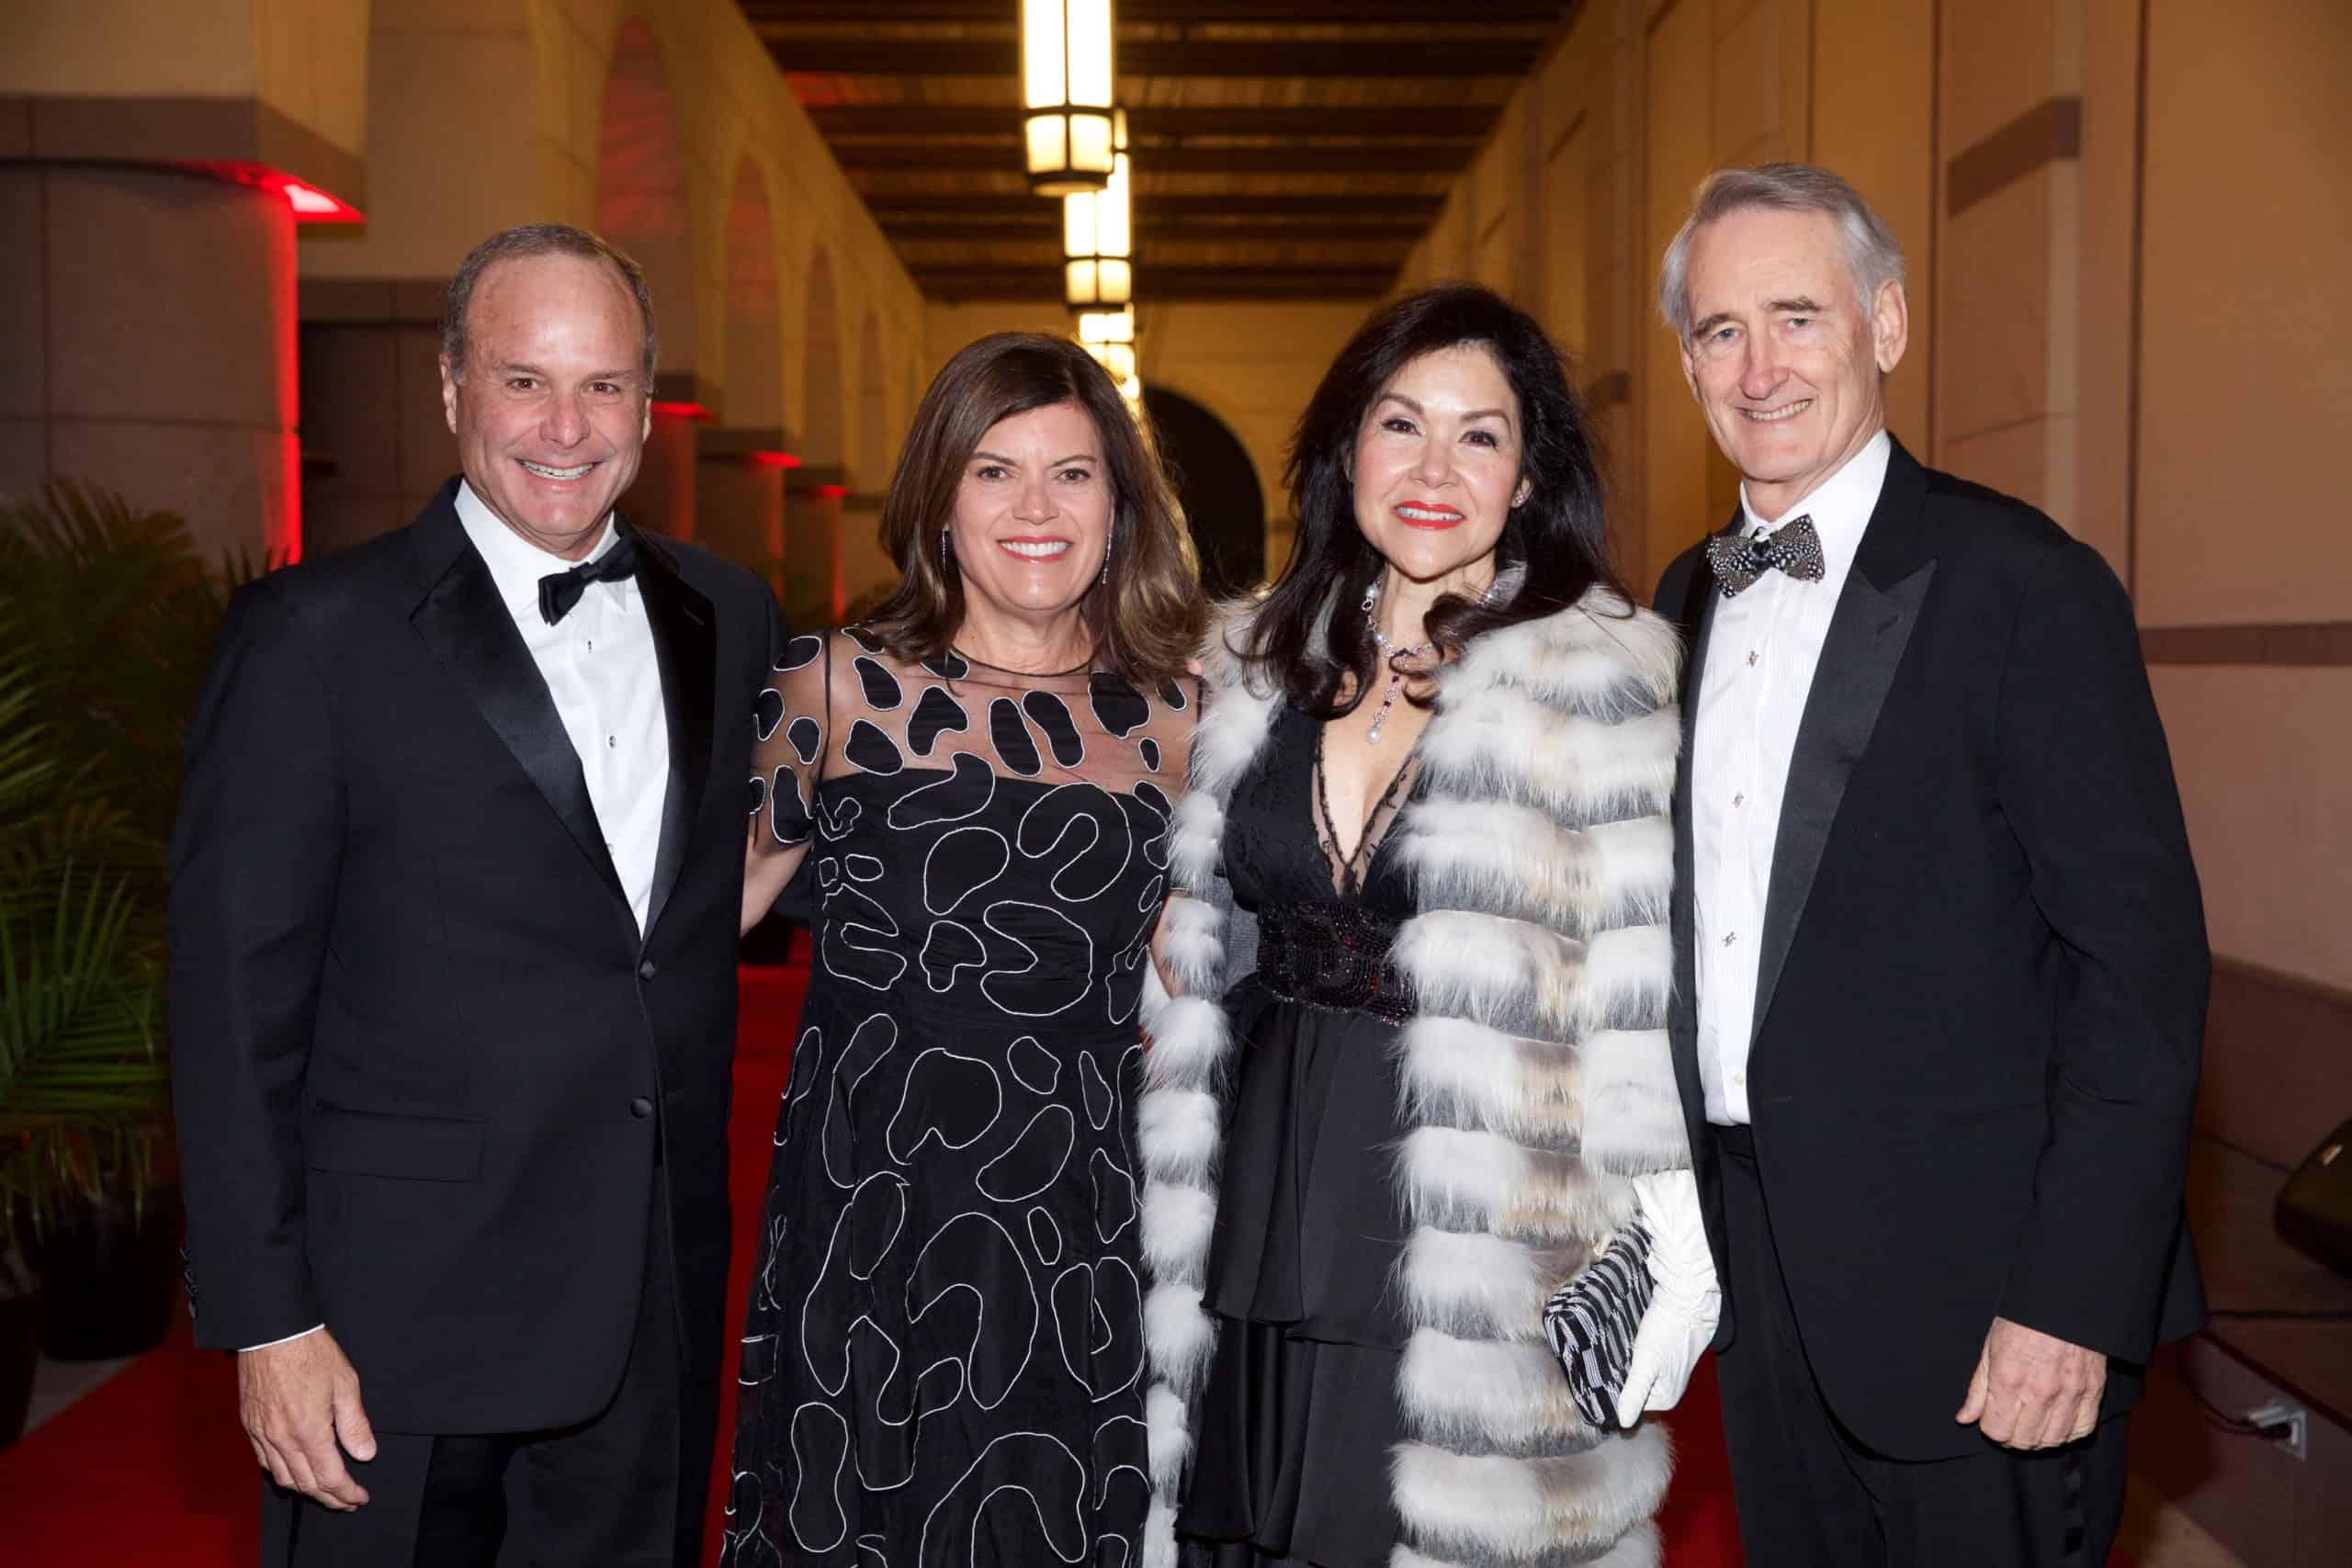 Steve and Joan Clark _ Geraldina and Scott Wise